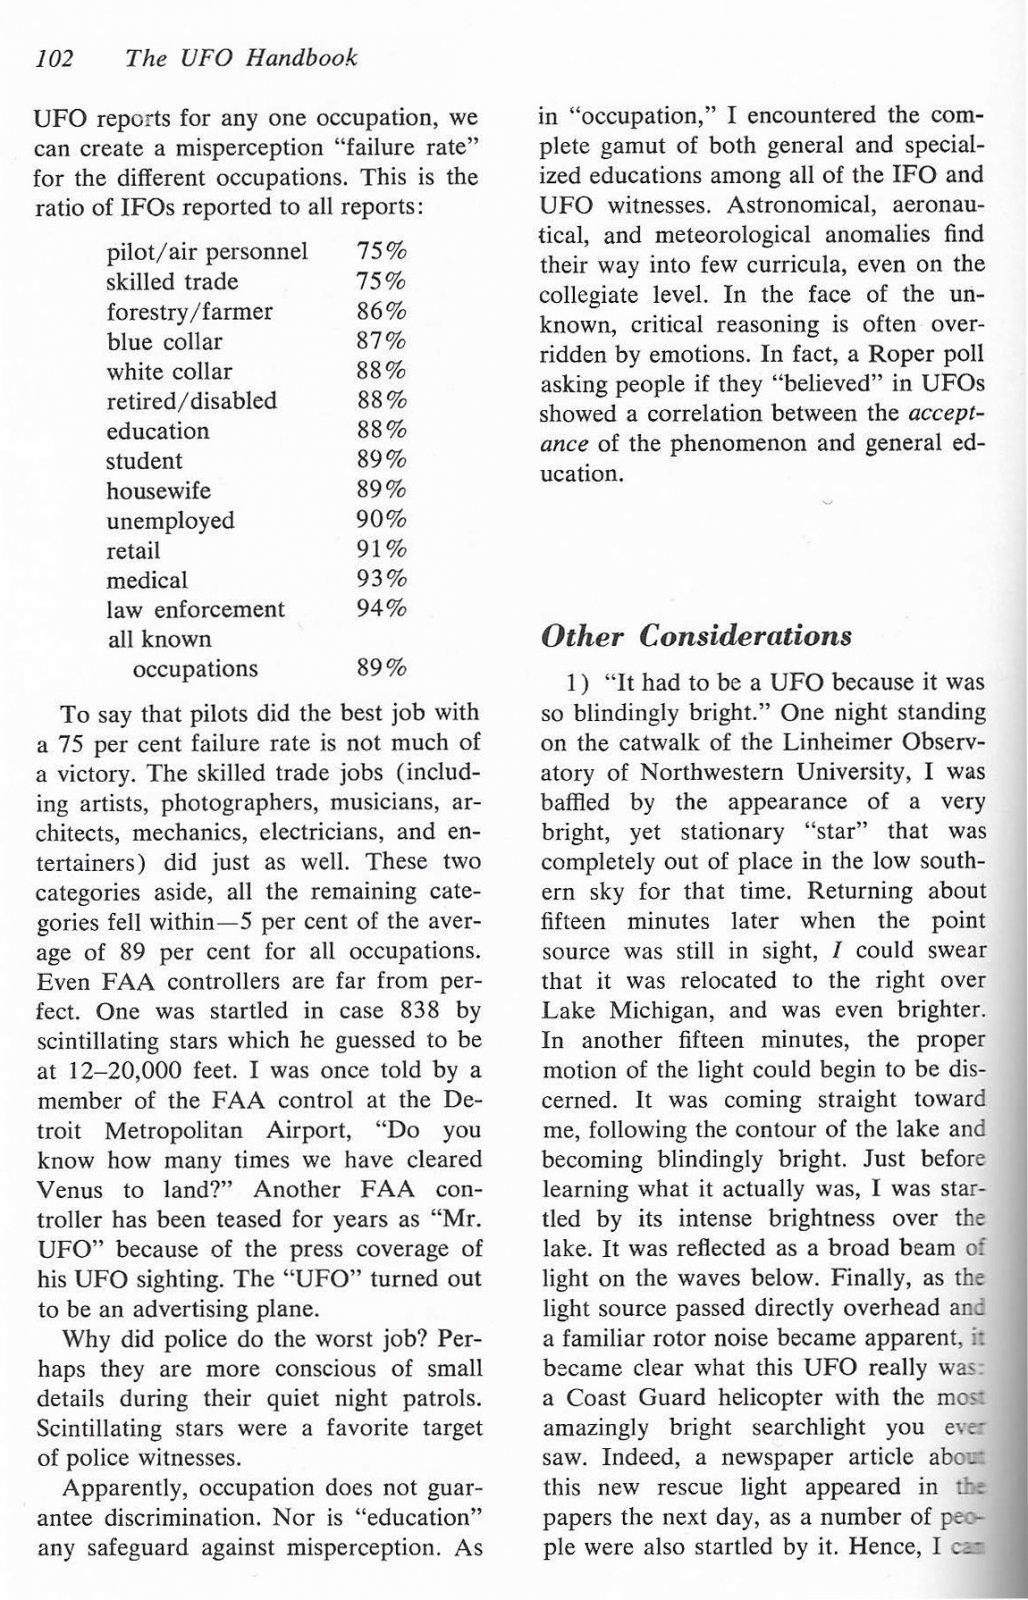 UFO Handbook 2.jpg